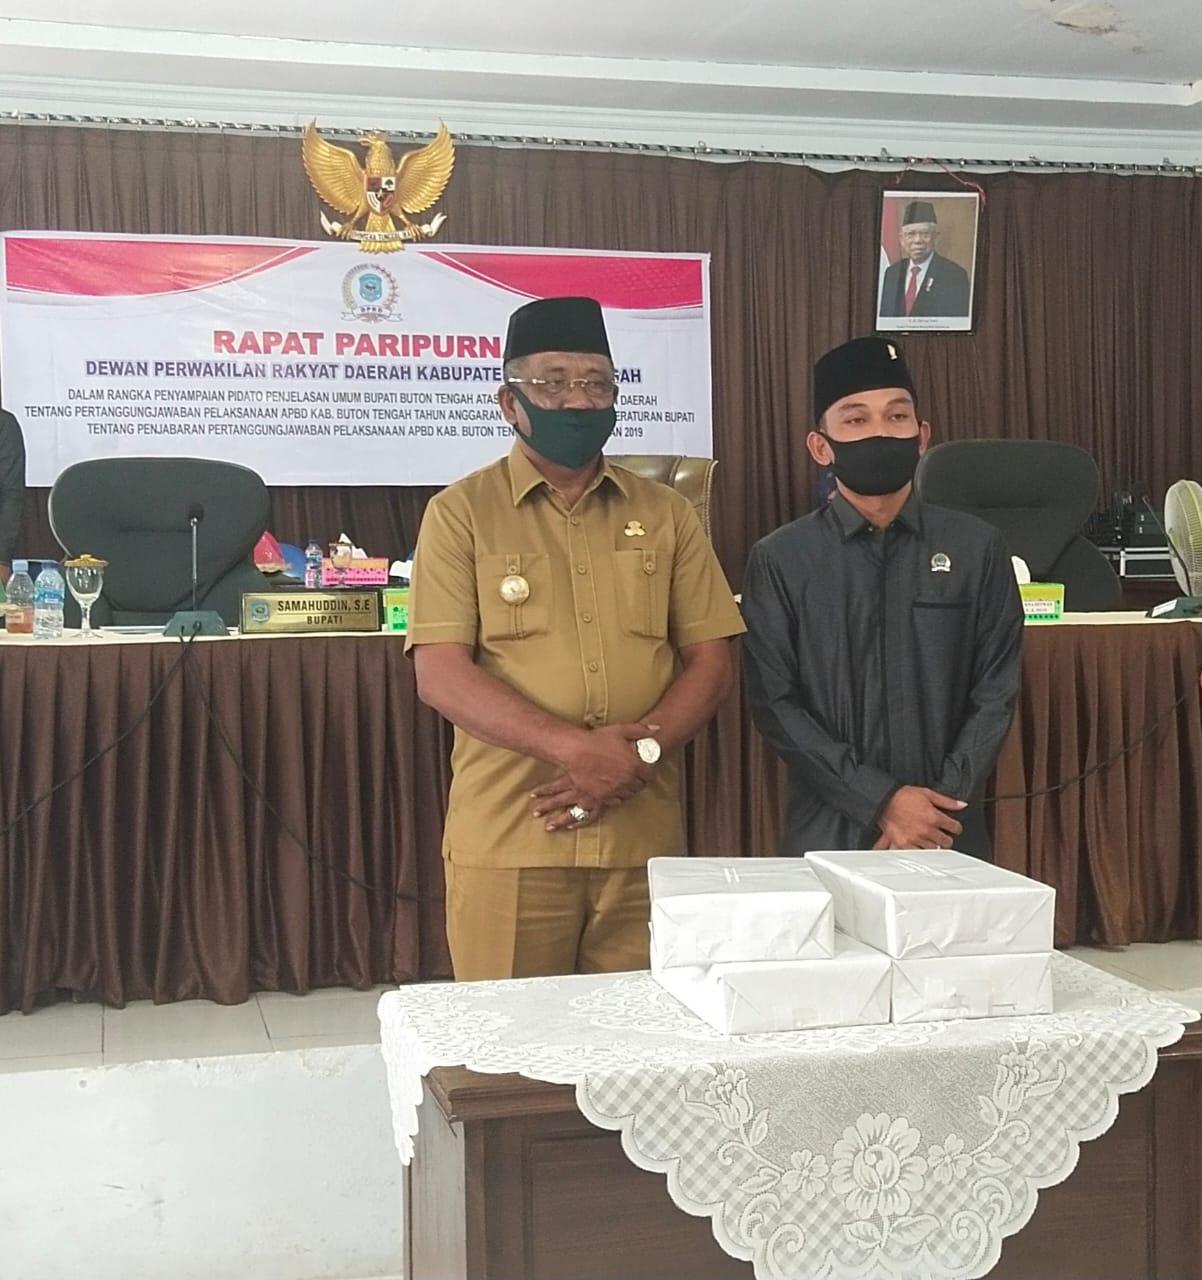 Jelang HUT, Samahuddin Larang Kadis dan Anggota DPRD Keluar Daerah